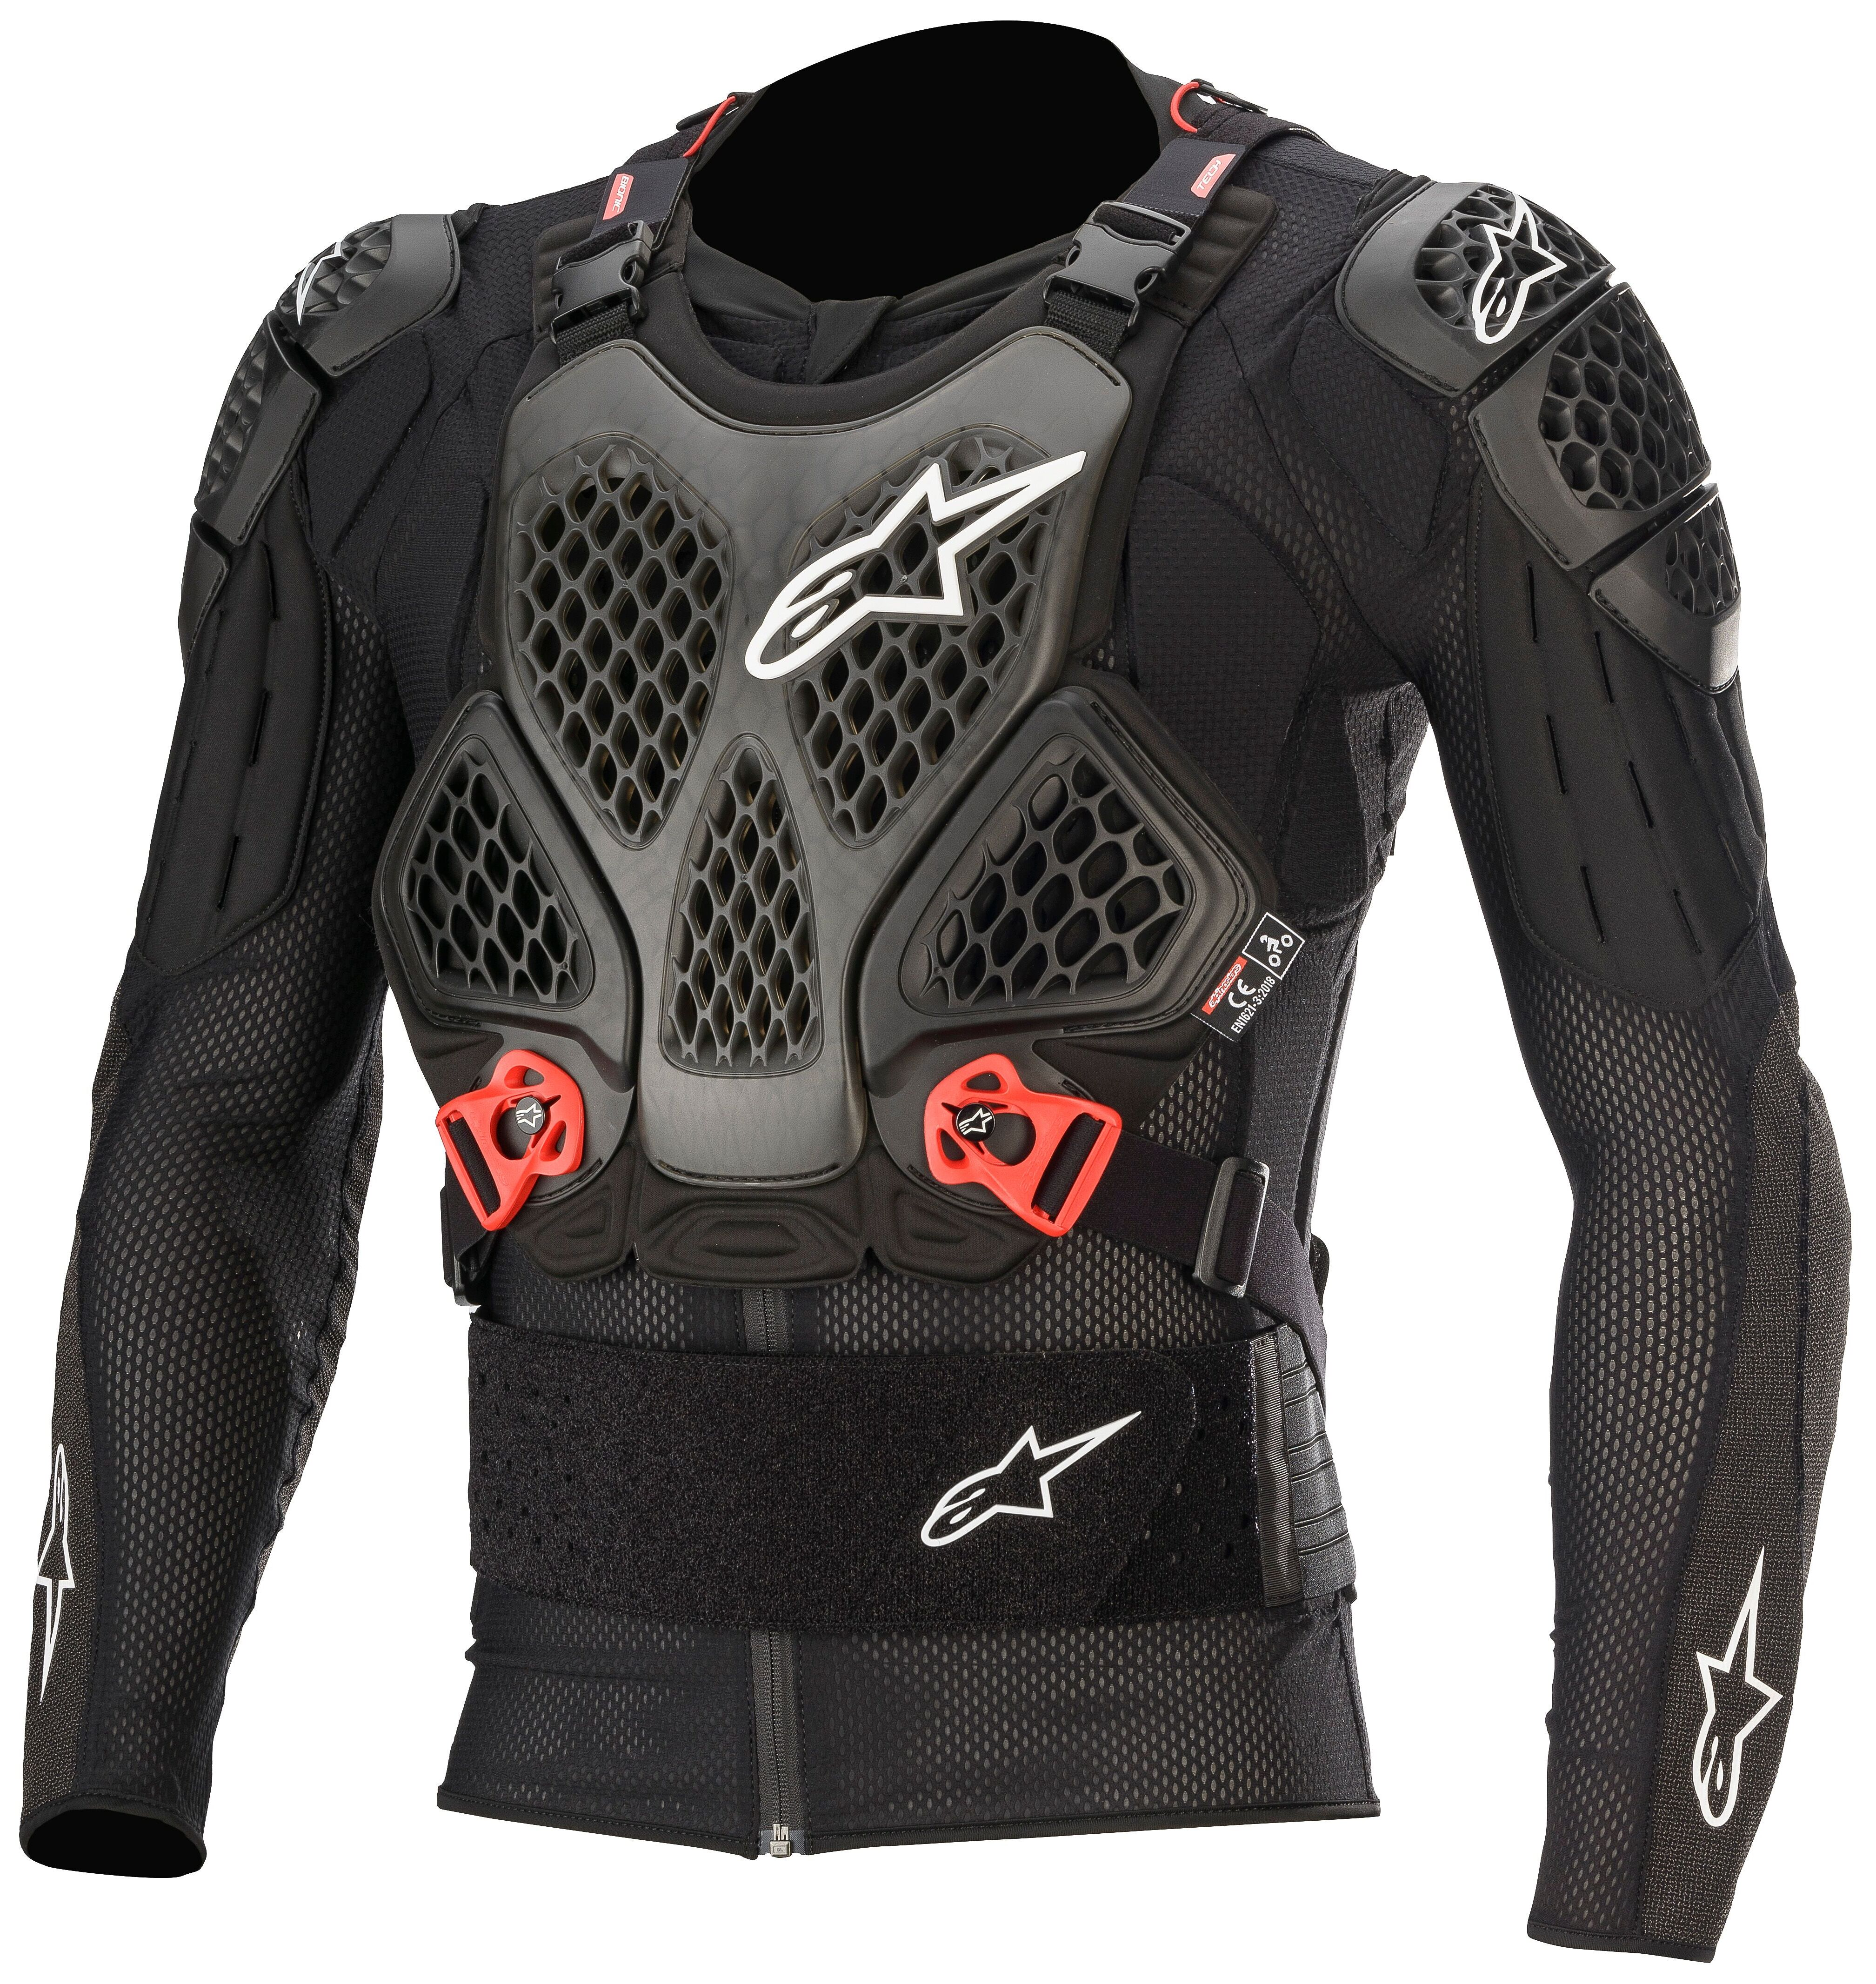 RED ALL SIZES NEW ALPINESTARS COMP PRO MOTOCROSS MX PROTECTIVE SHORTS BLACK